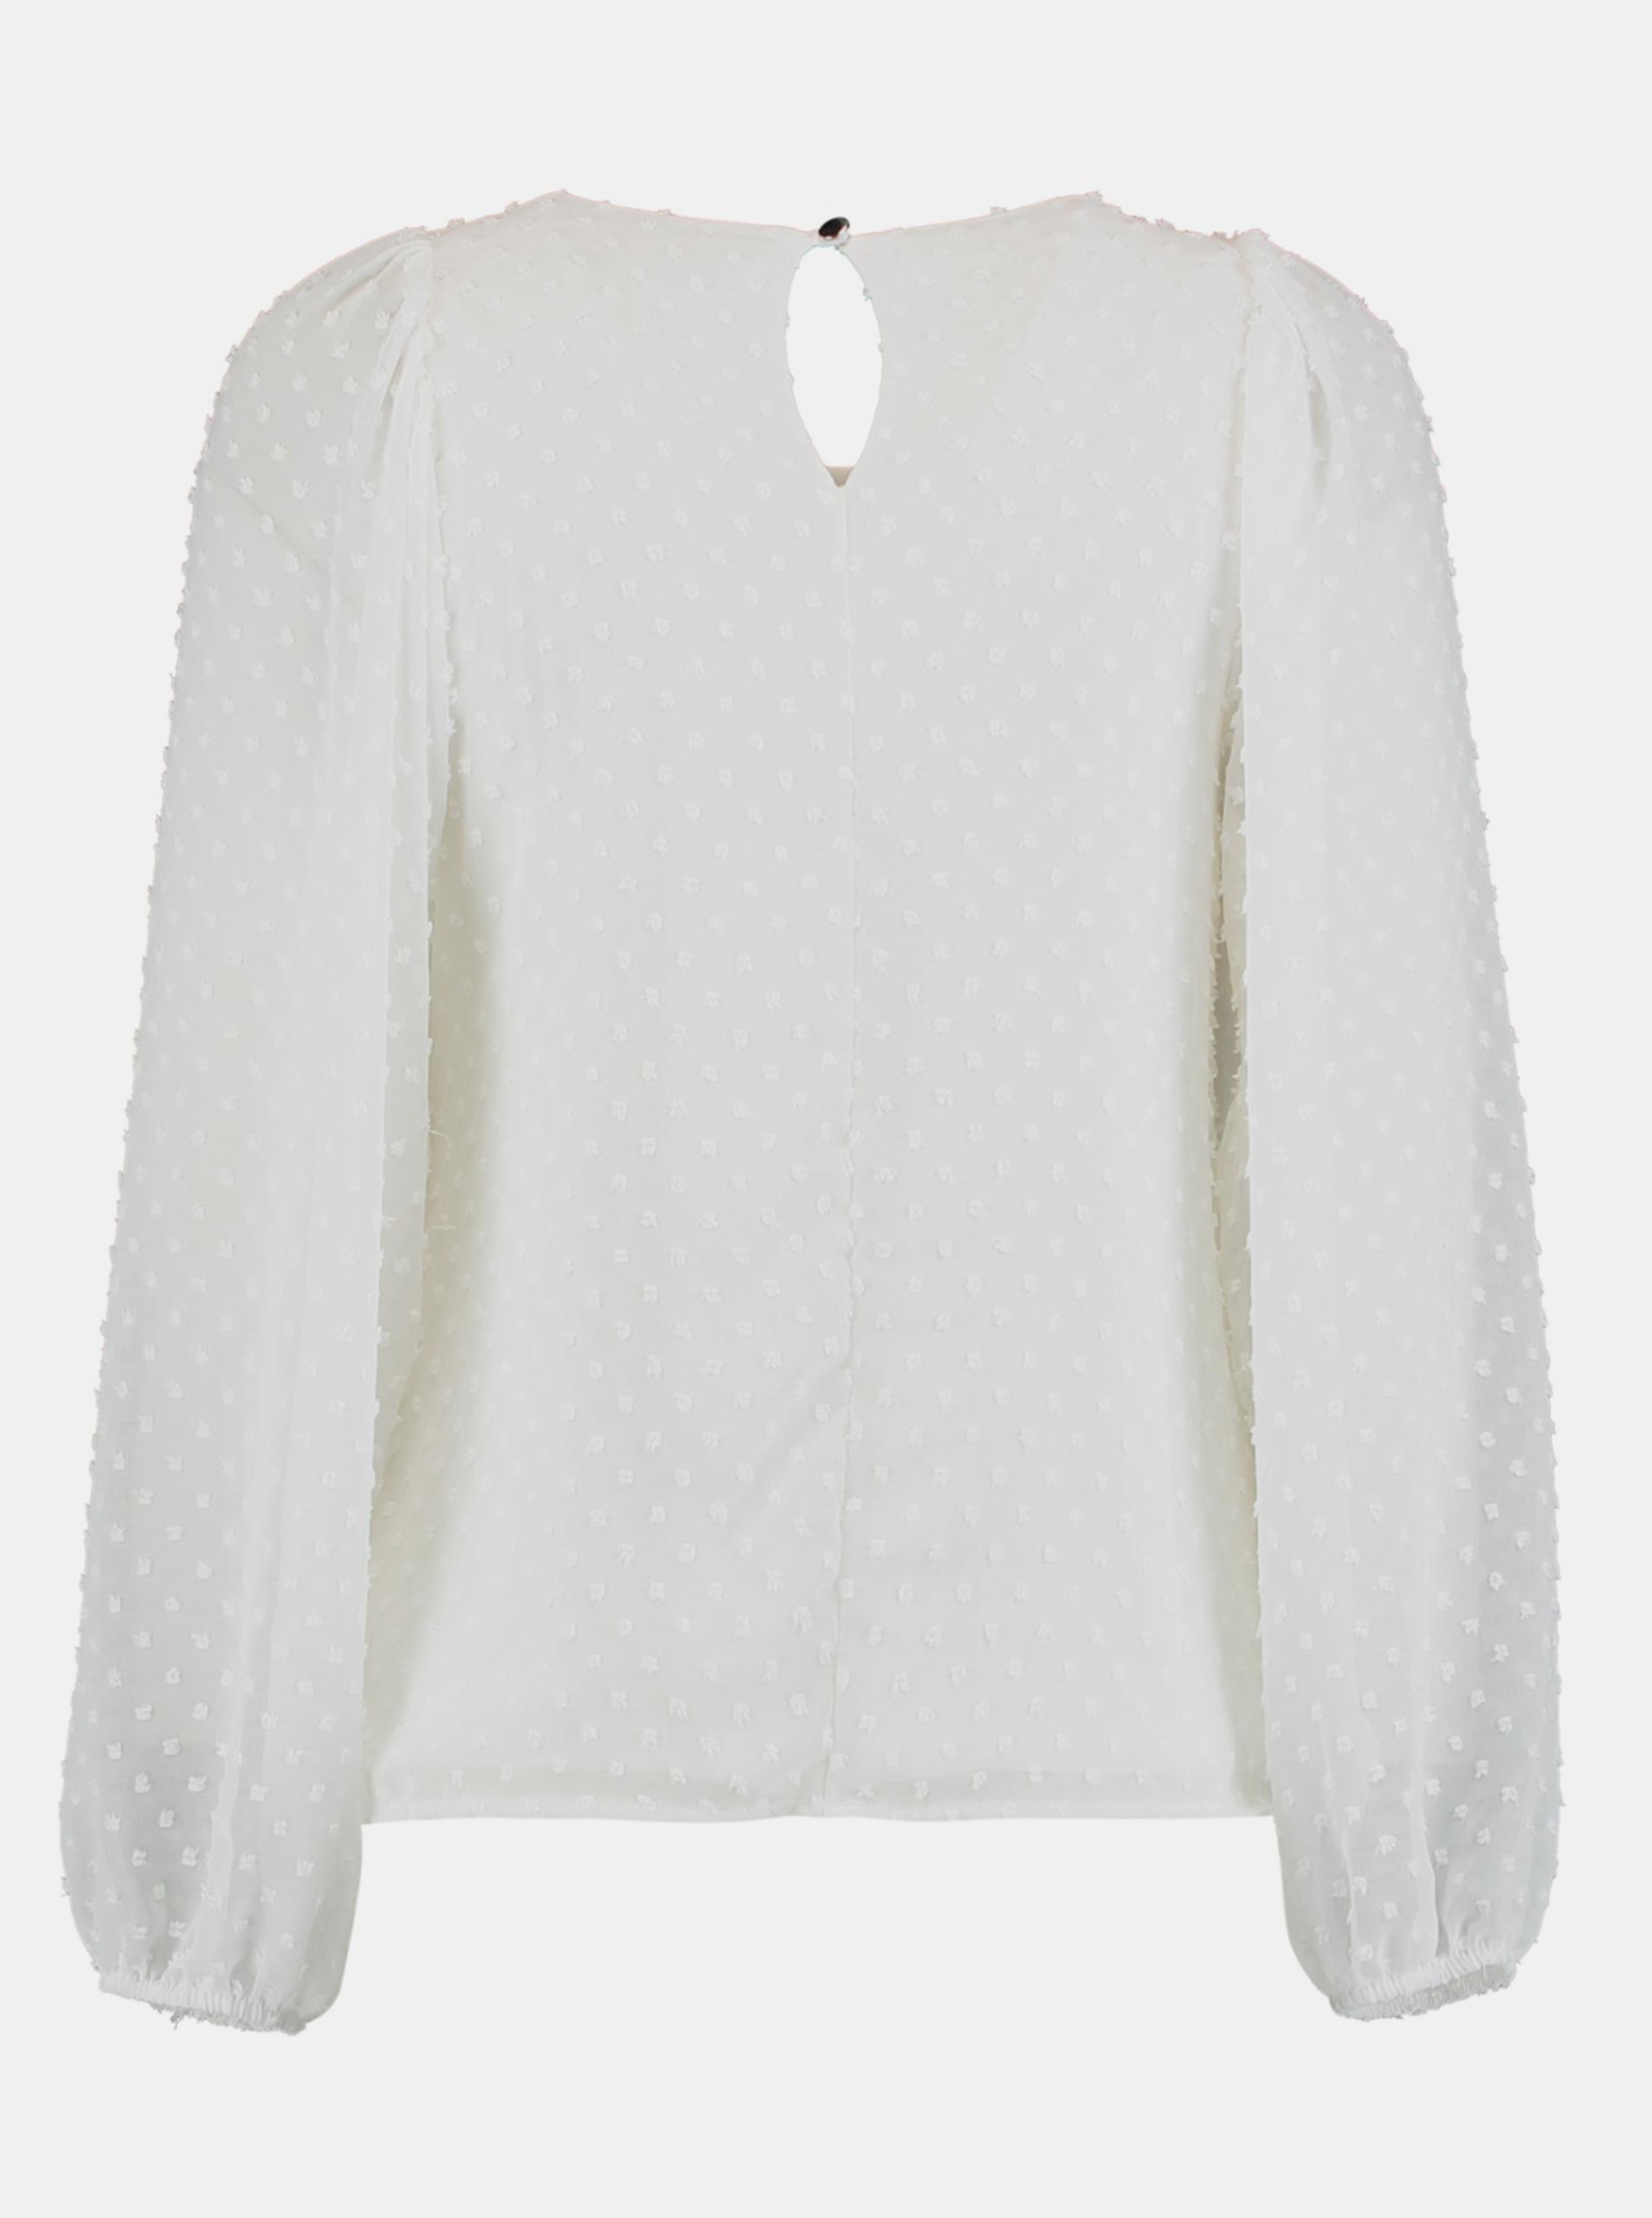 Hailys white blouse